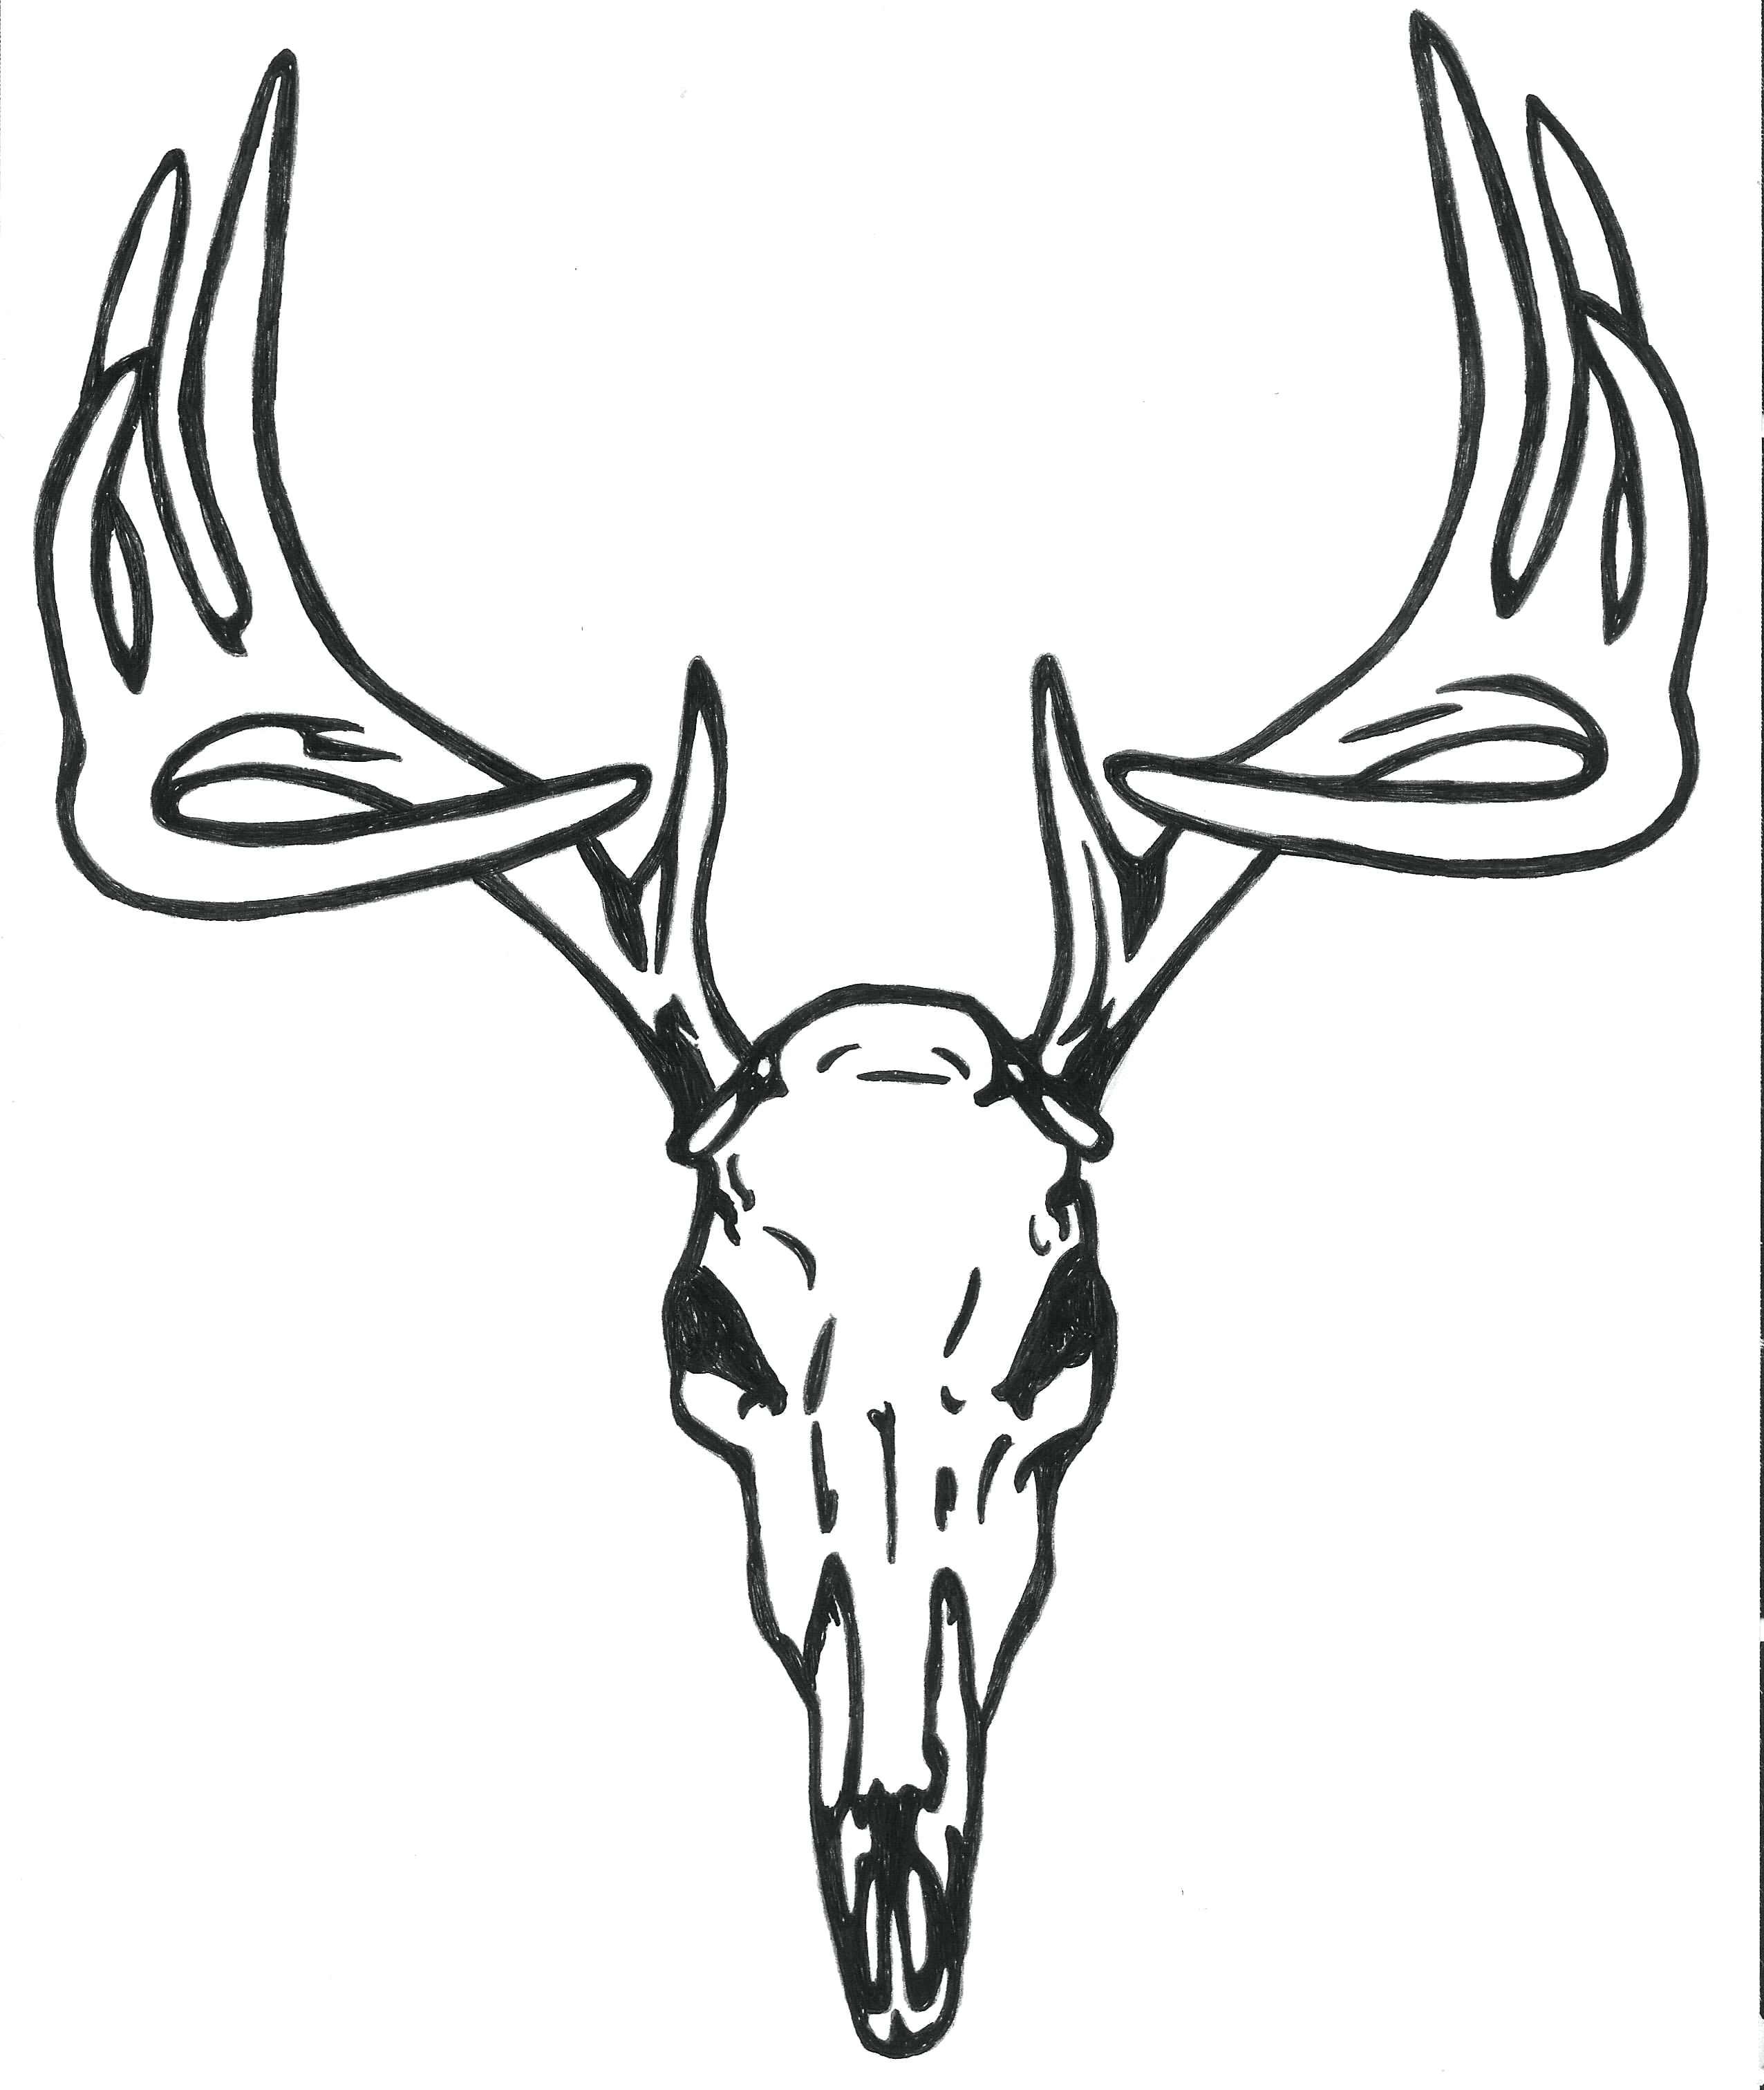 2552x3023 Coloring Deer Head Coloring Pages On Skull Logo Face. Deer Head